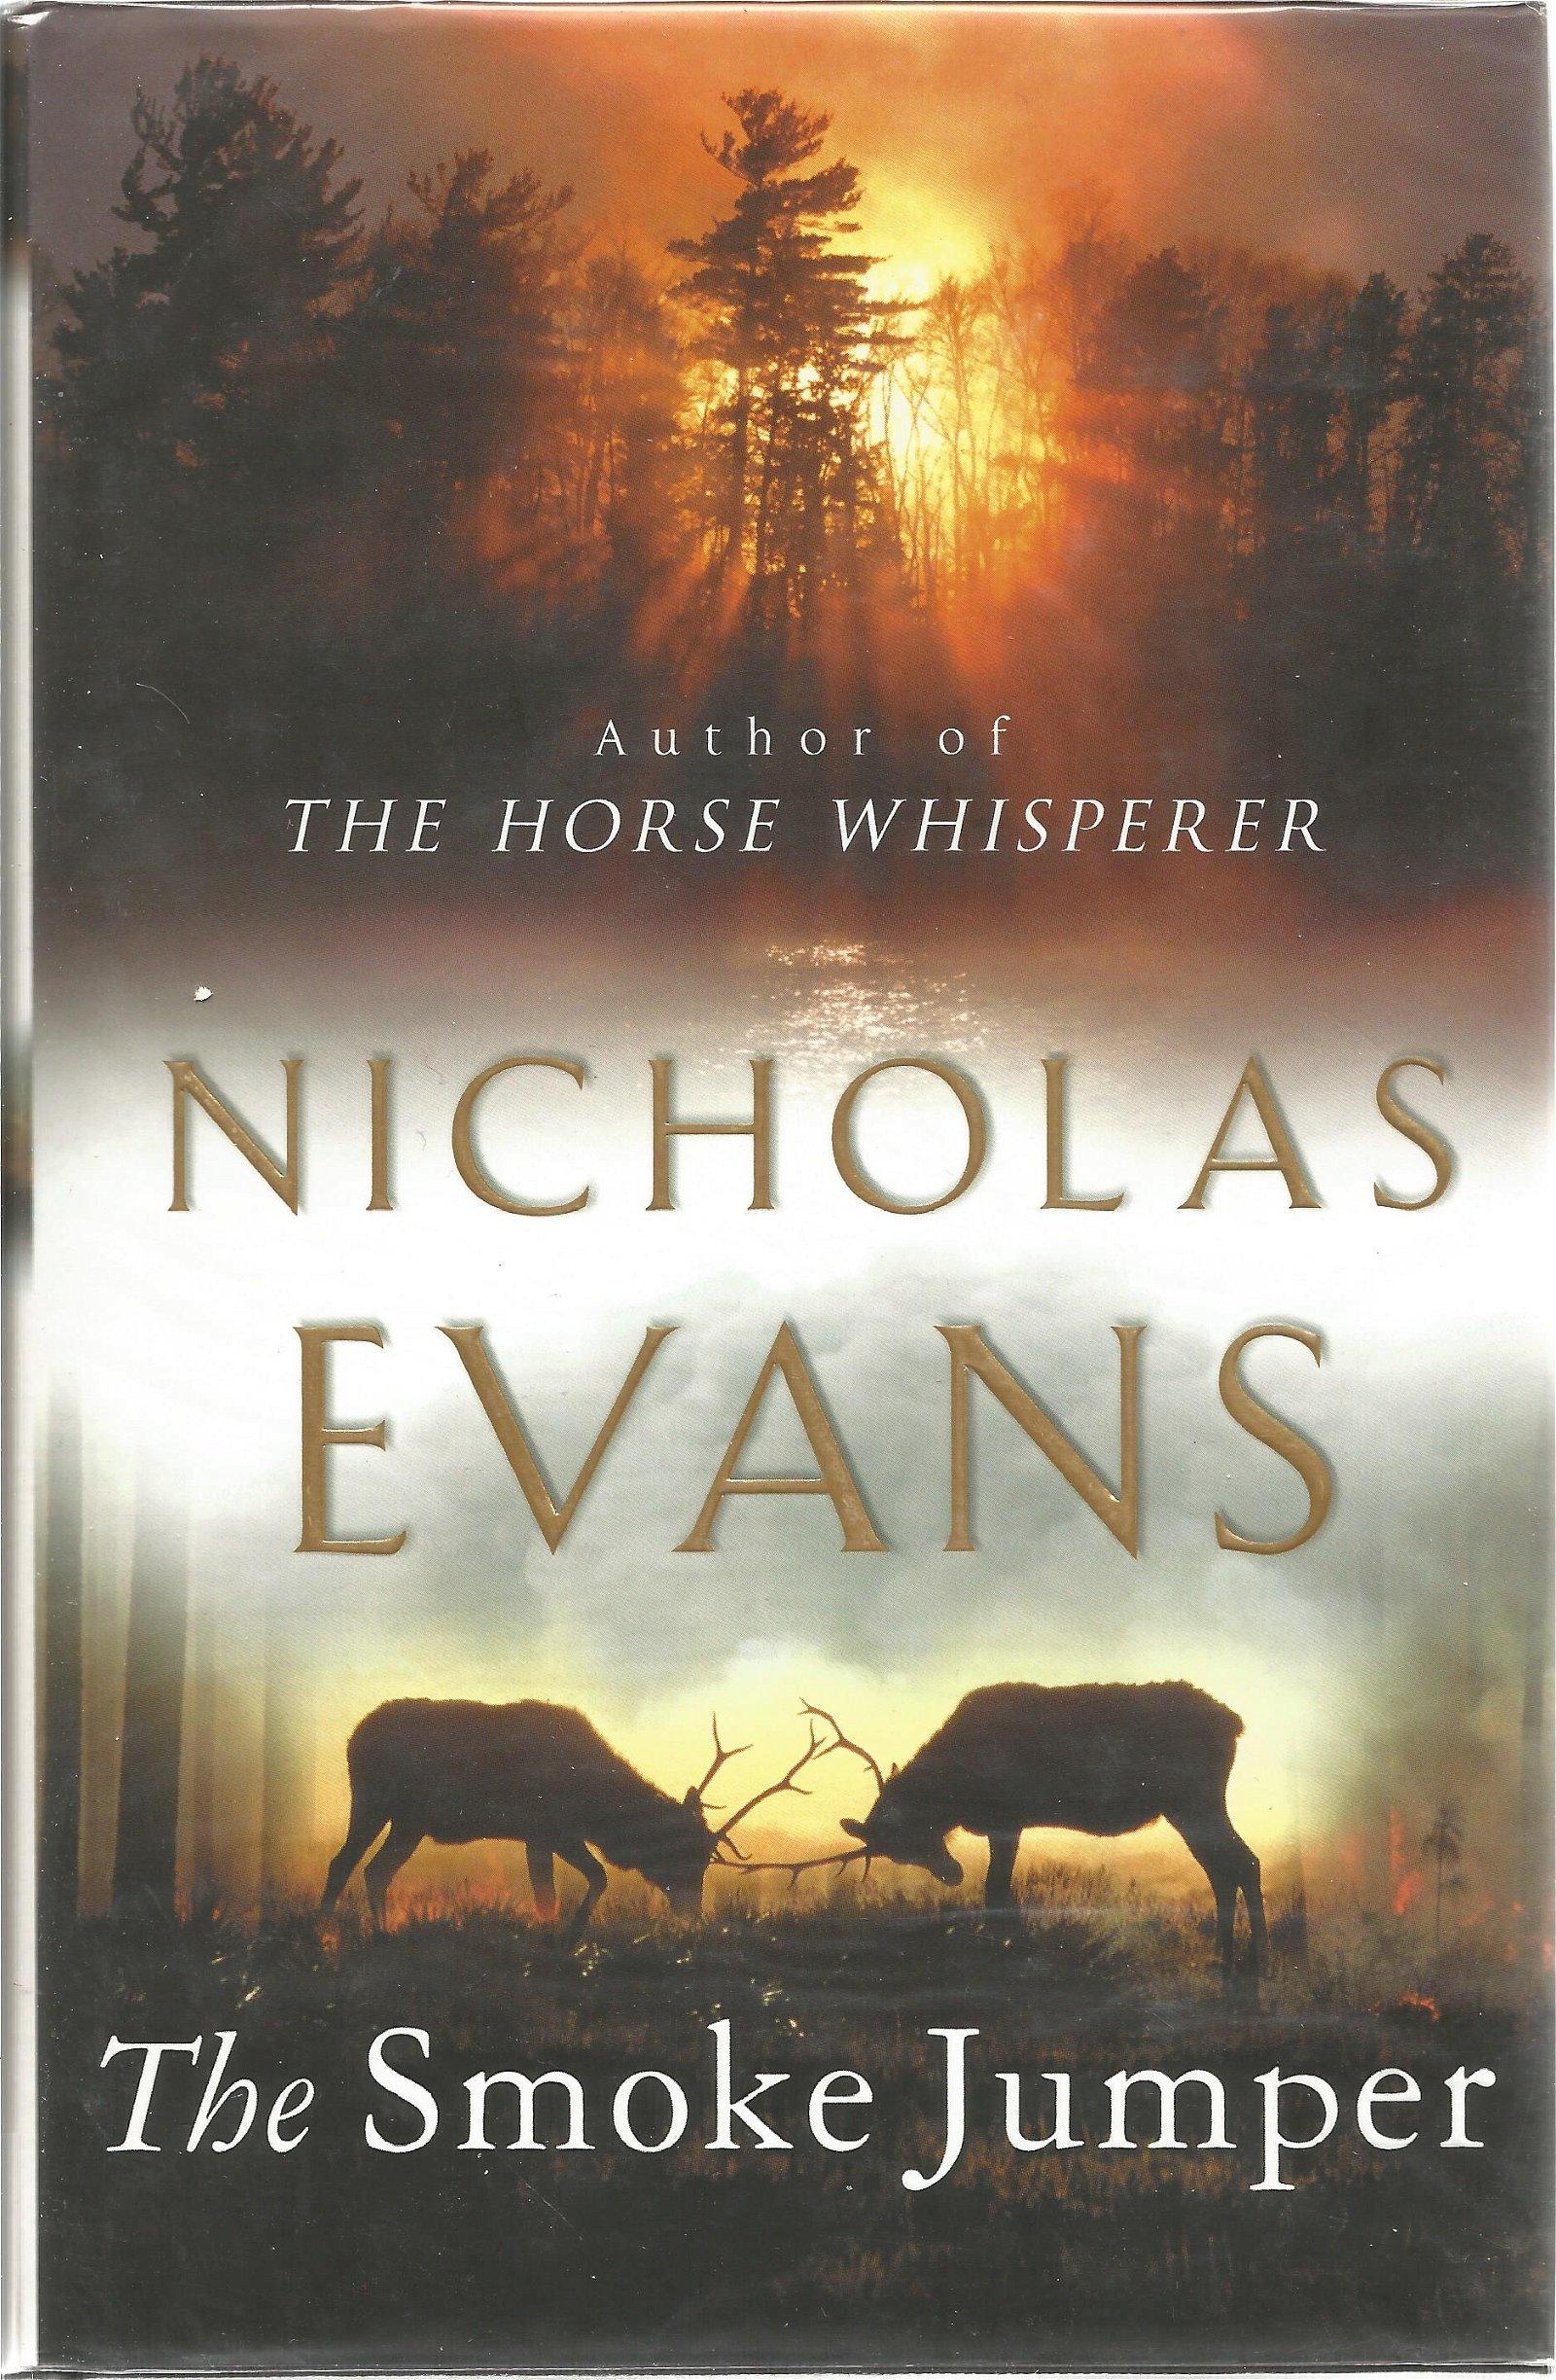 Nicholas Evans signed The Smoke Jumper. Hard back book